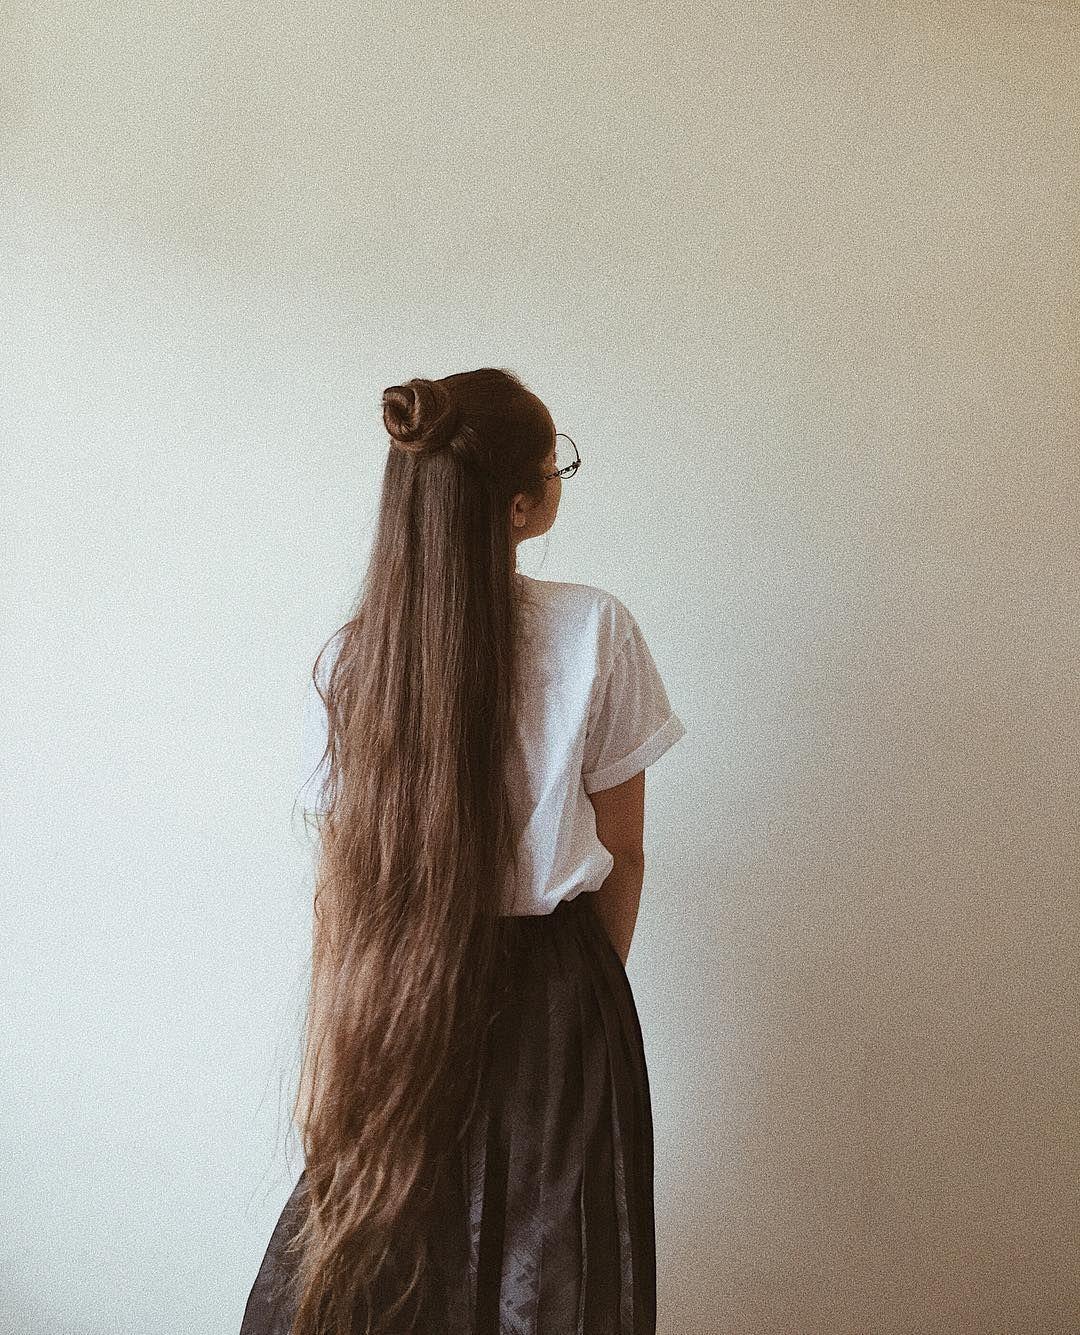 Rebeccapeppeler Long Hair Tumblr Hair Styles Long Hair Girl